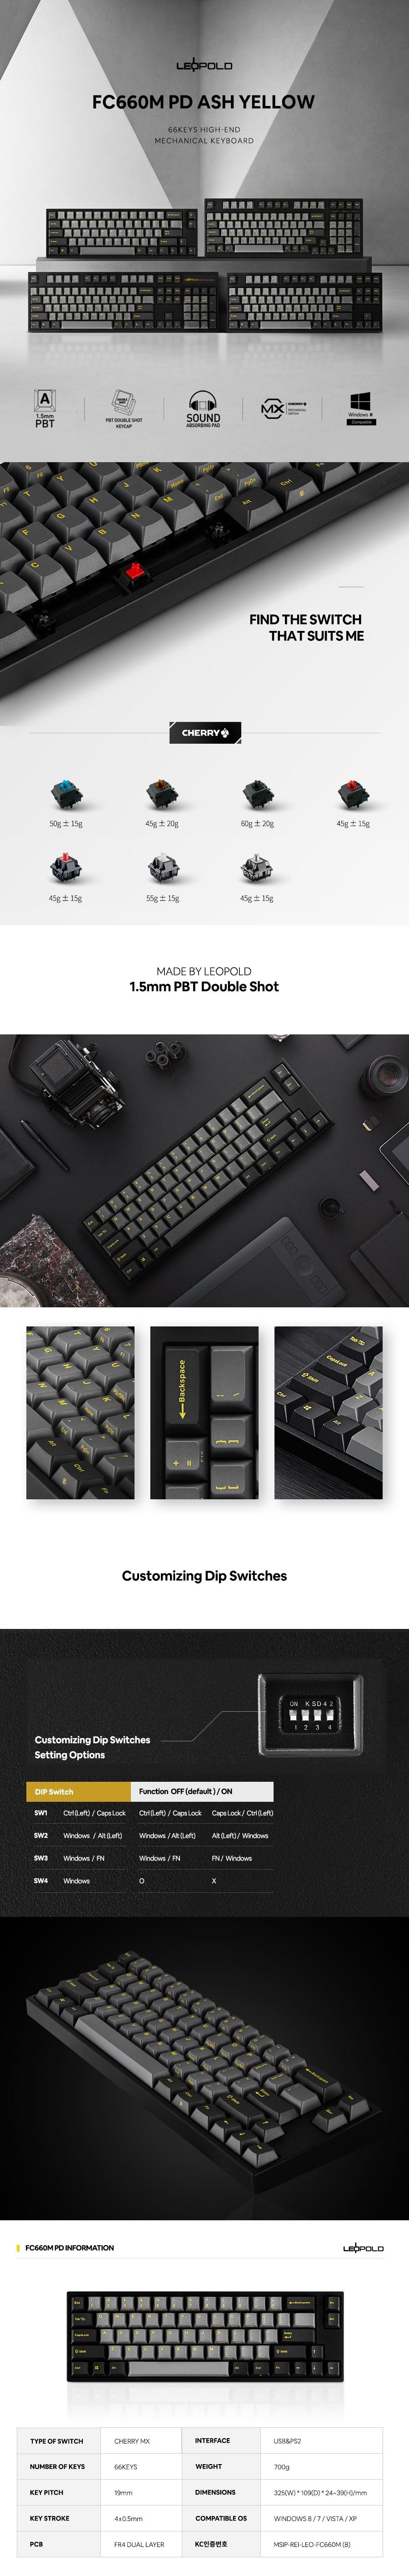 Leopold FC660M Ash YF TKL Mechanical Keyboard - Overview 1